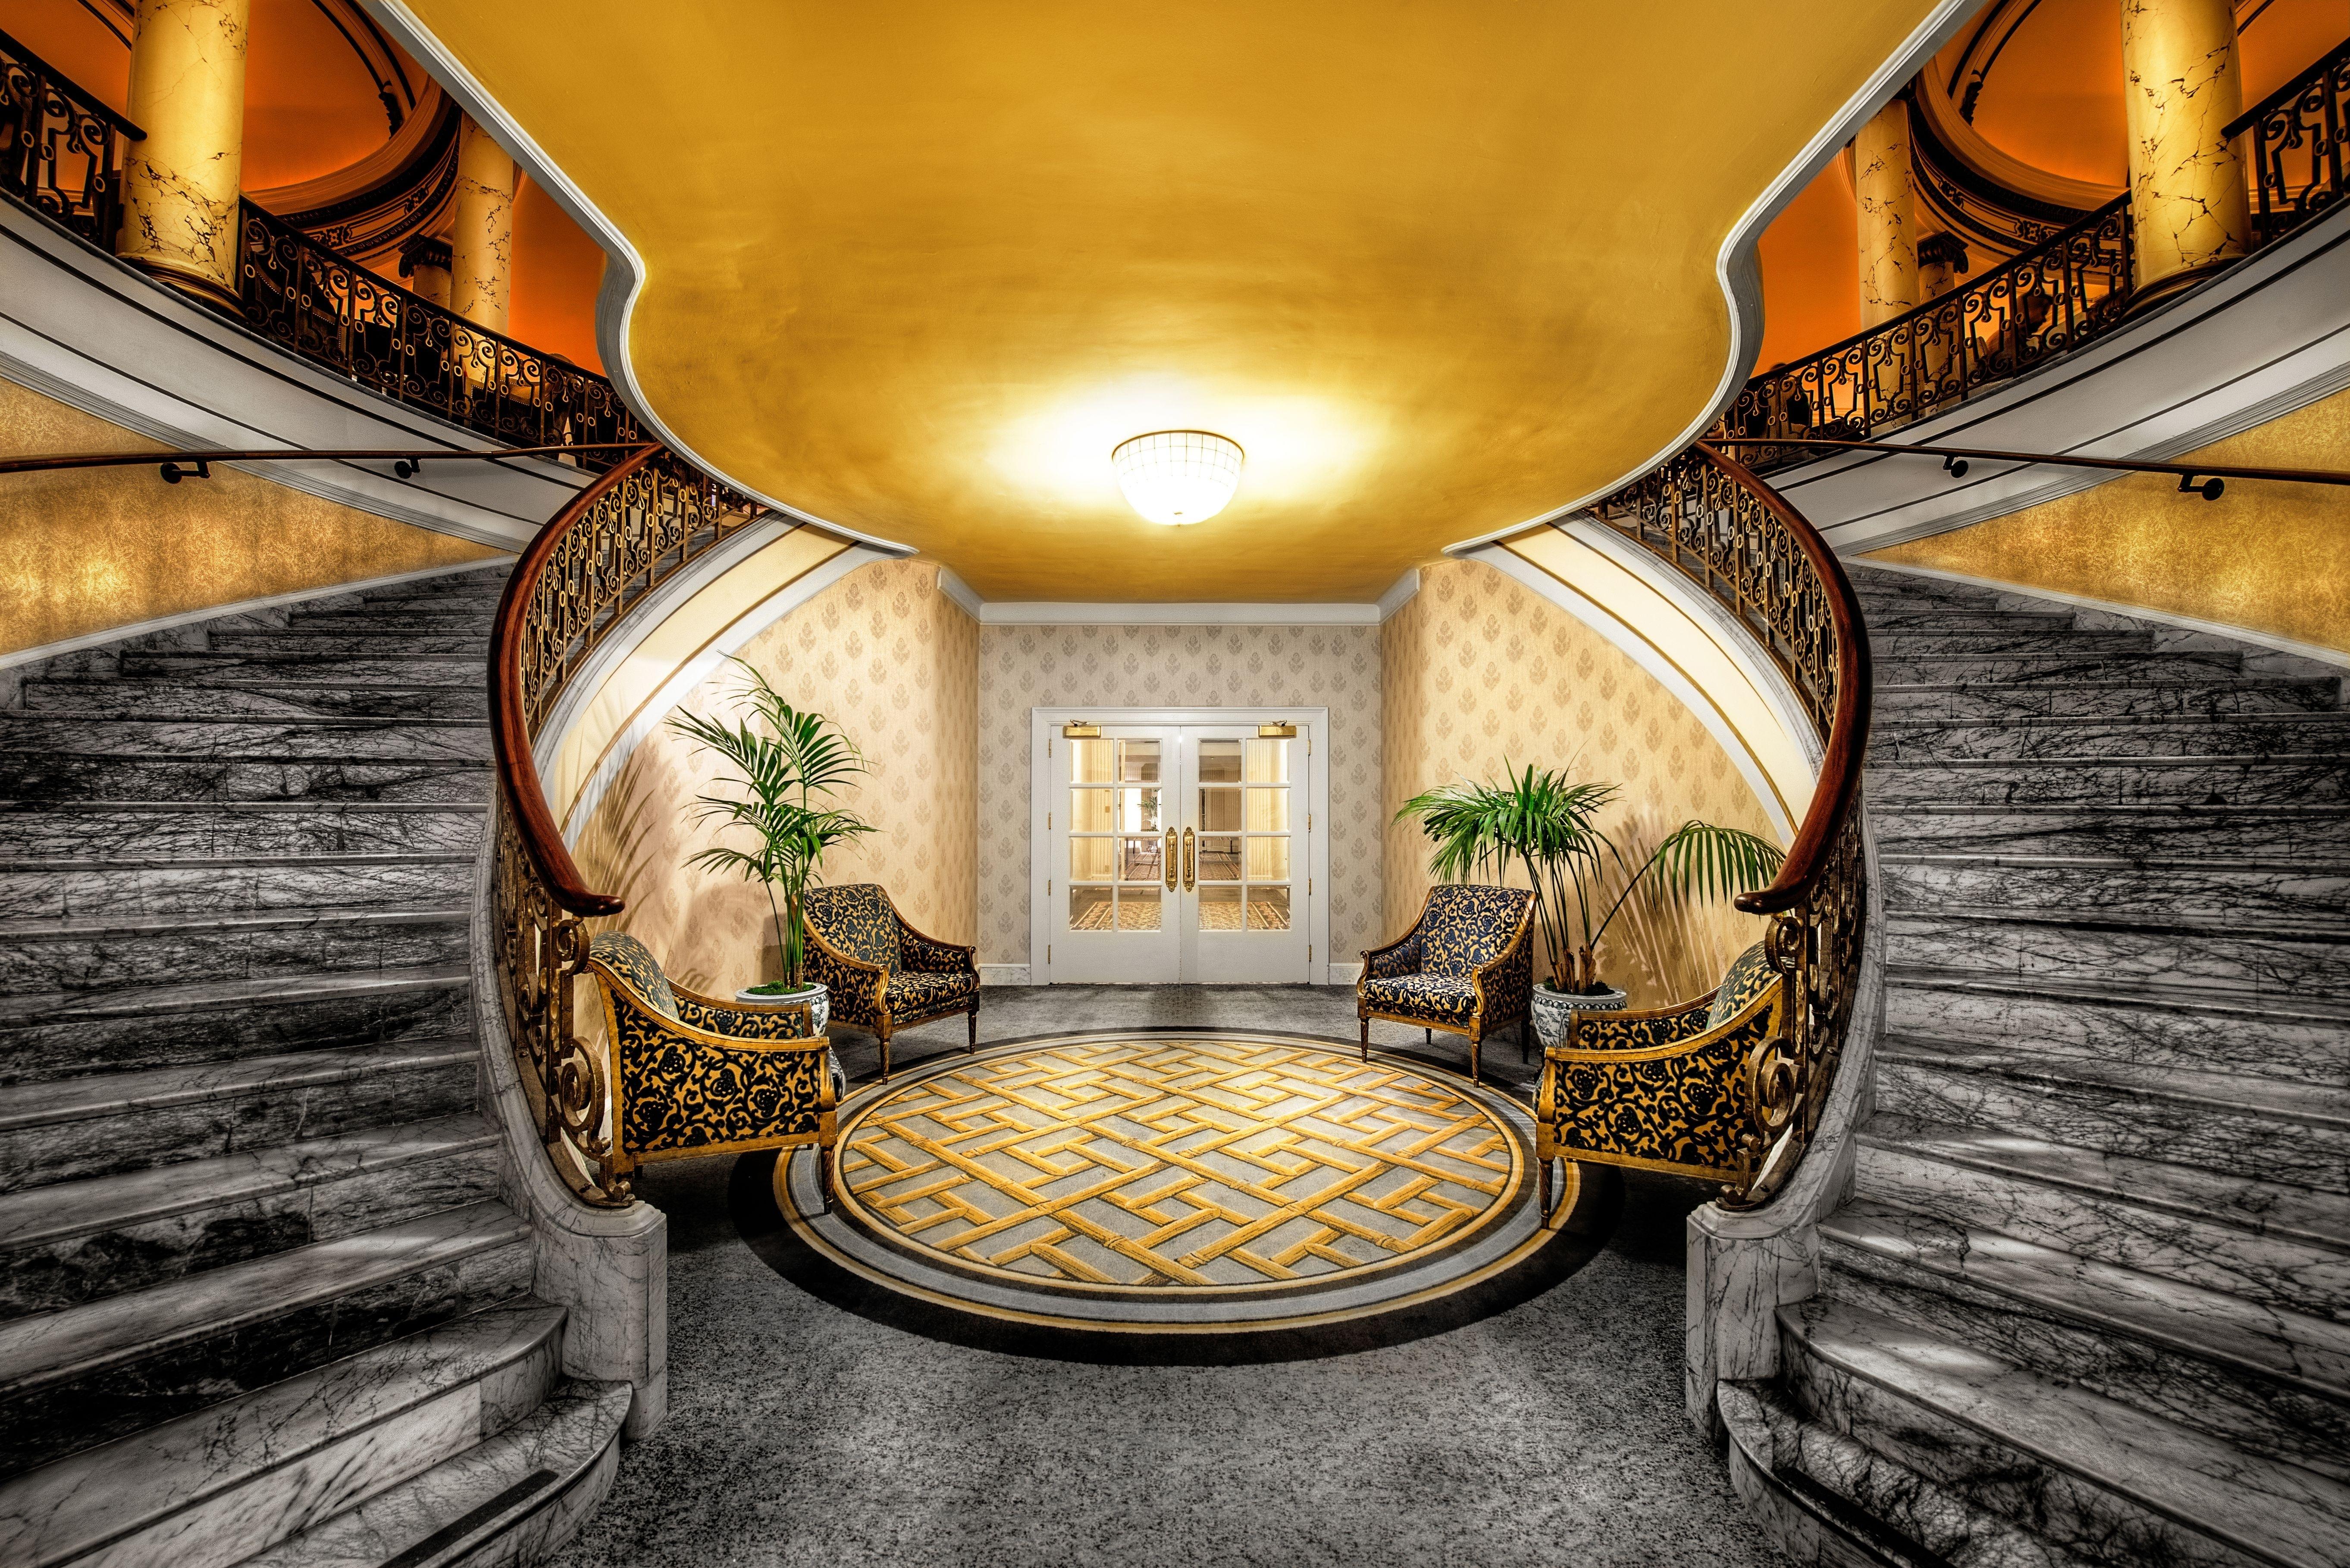 интерьер лестница  № 3534810 без смс